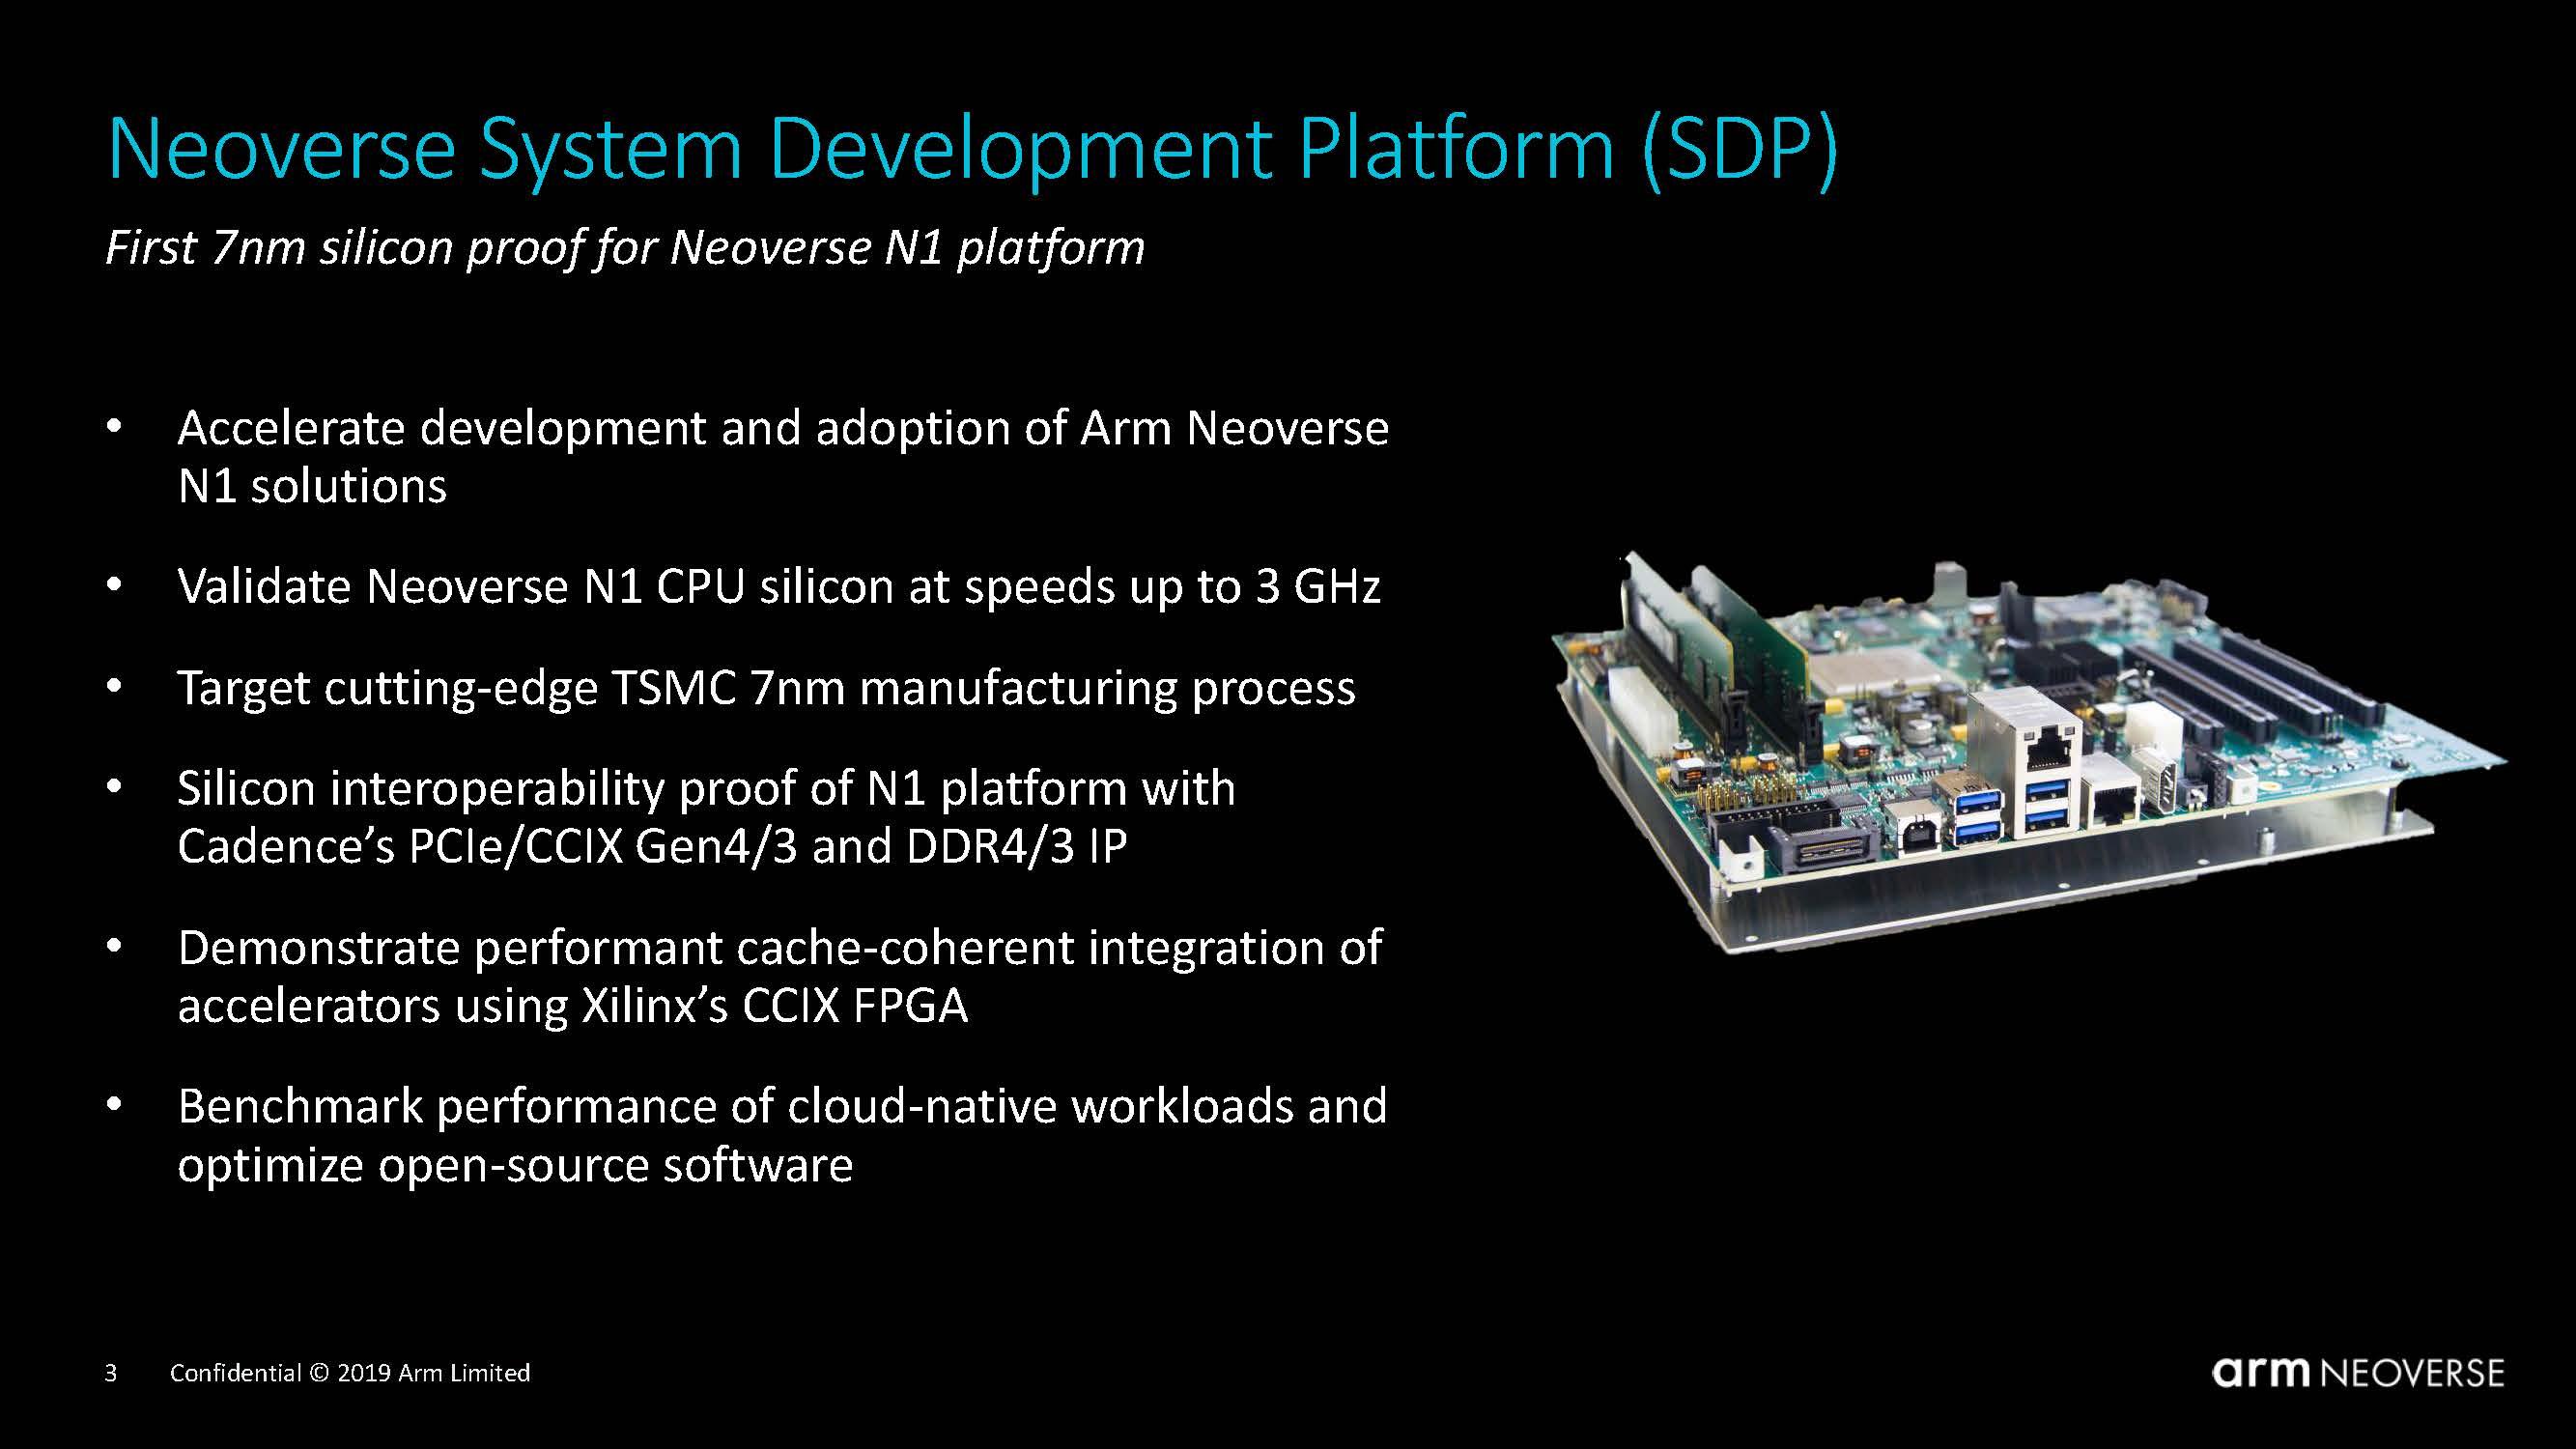 Arm Neoverse N1 System Development Platform